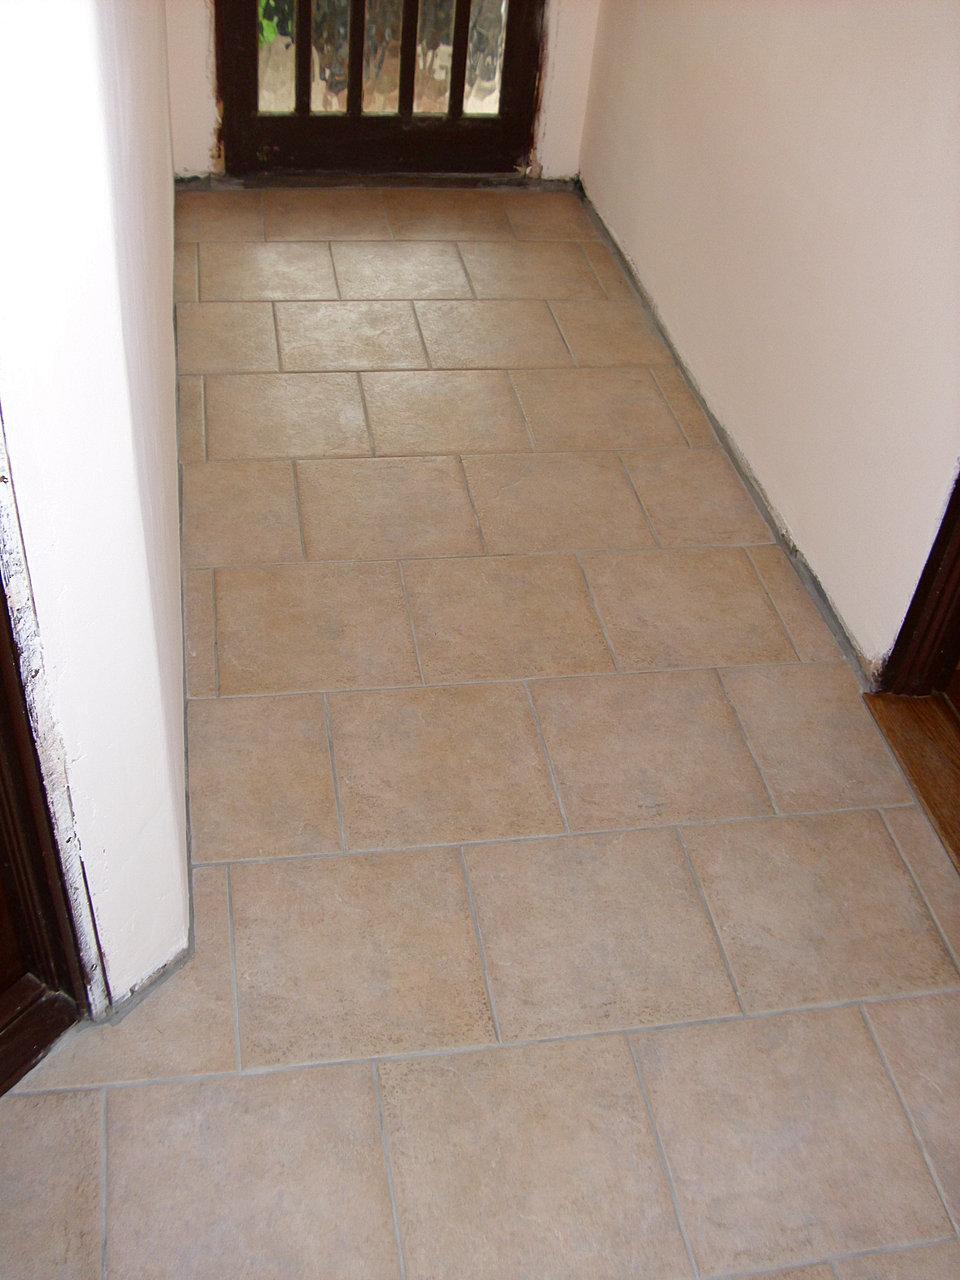 Shaun taylor bathrooms floor tiling outside the bathroom hallway in porcelain travertine effect floor tiles cross bonded dsci0001g dailygadgetfo Images